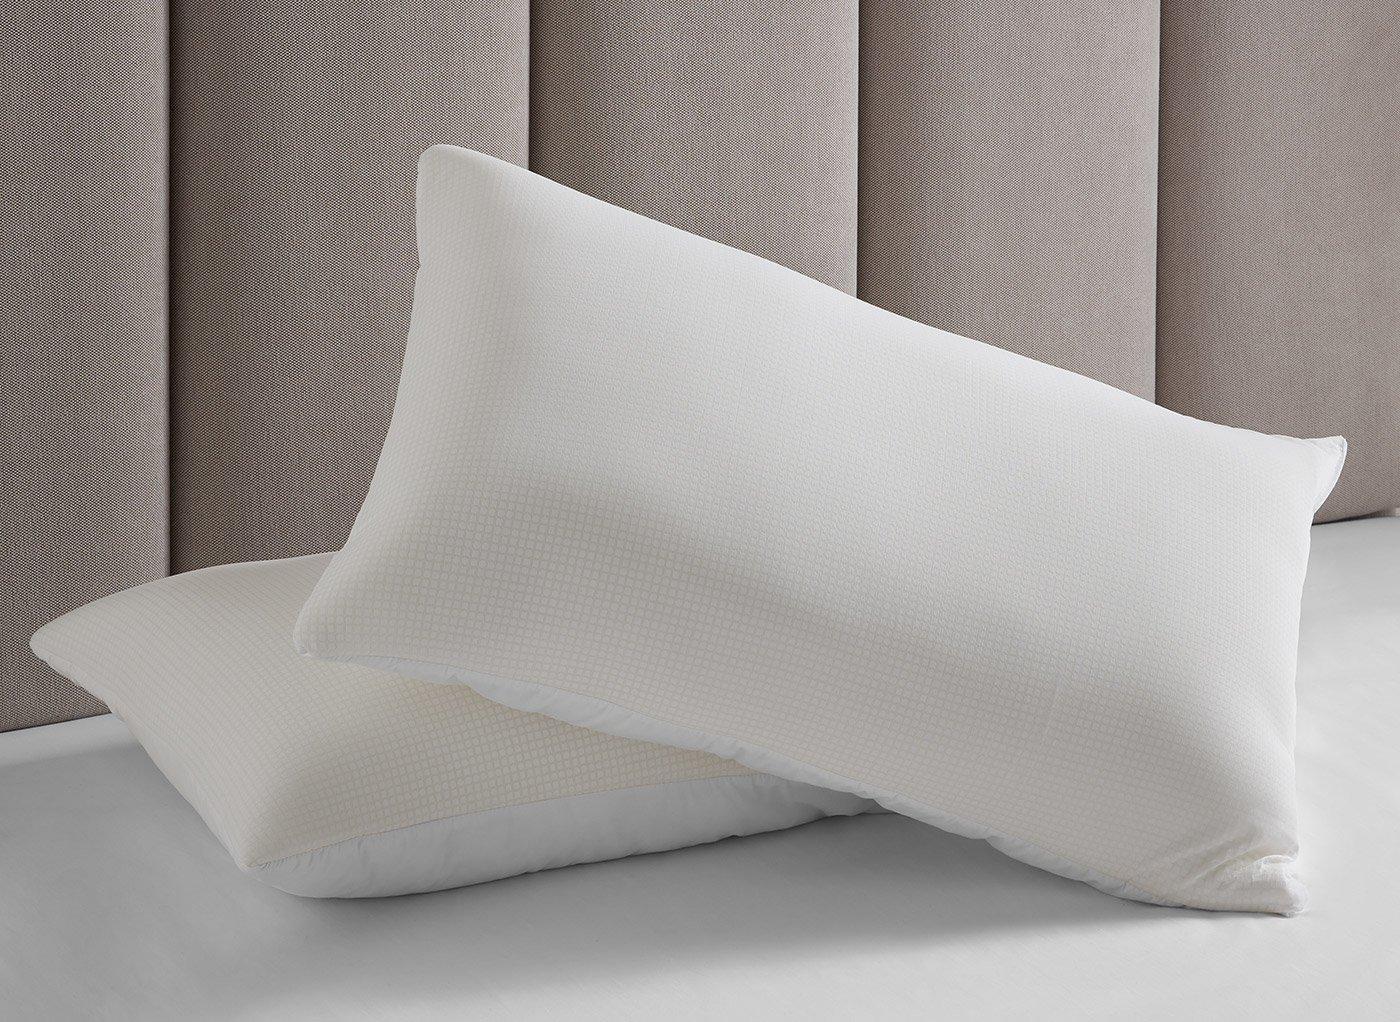 719 00201_main Shot_01_therapur Cool Pillow